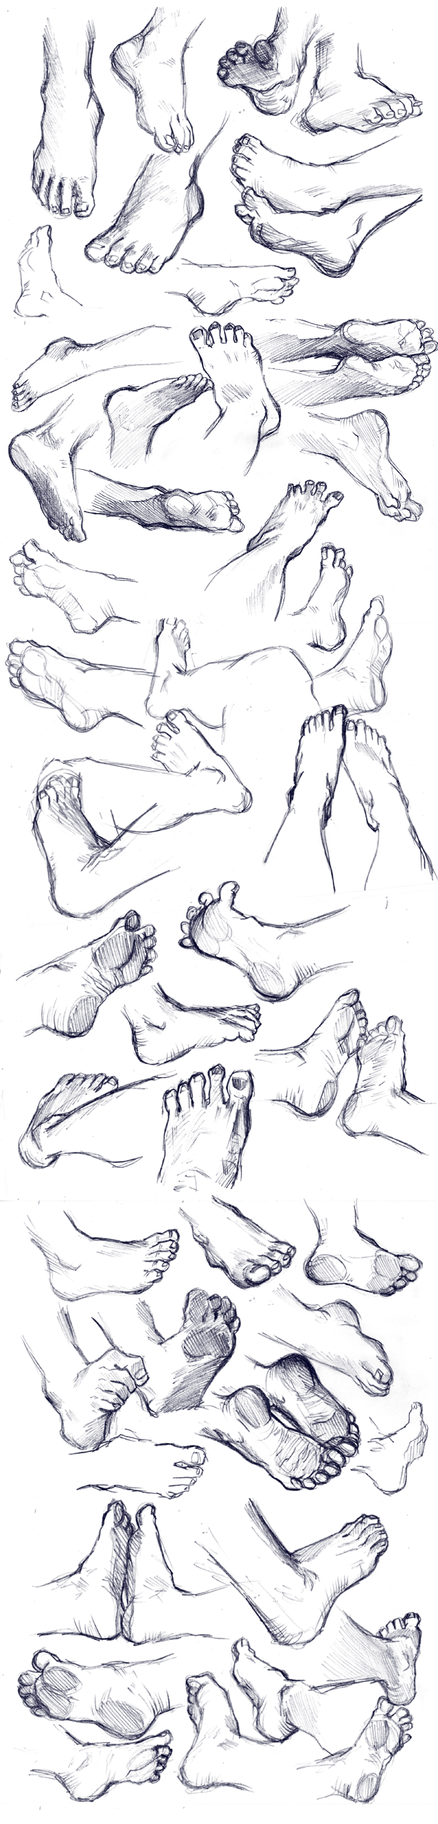 Feet Study by Yohiri